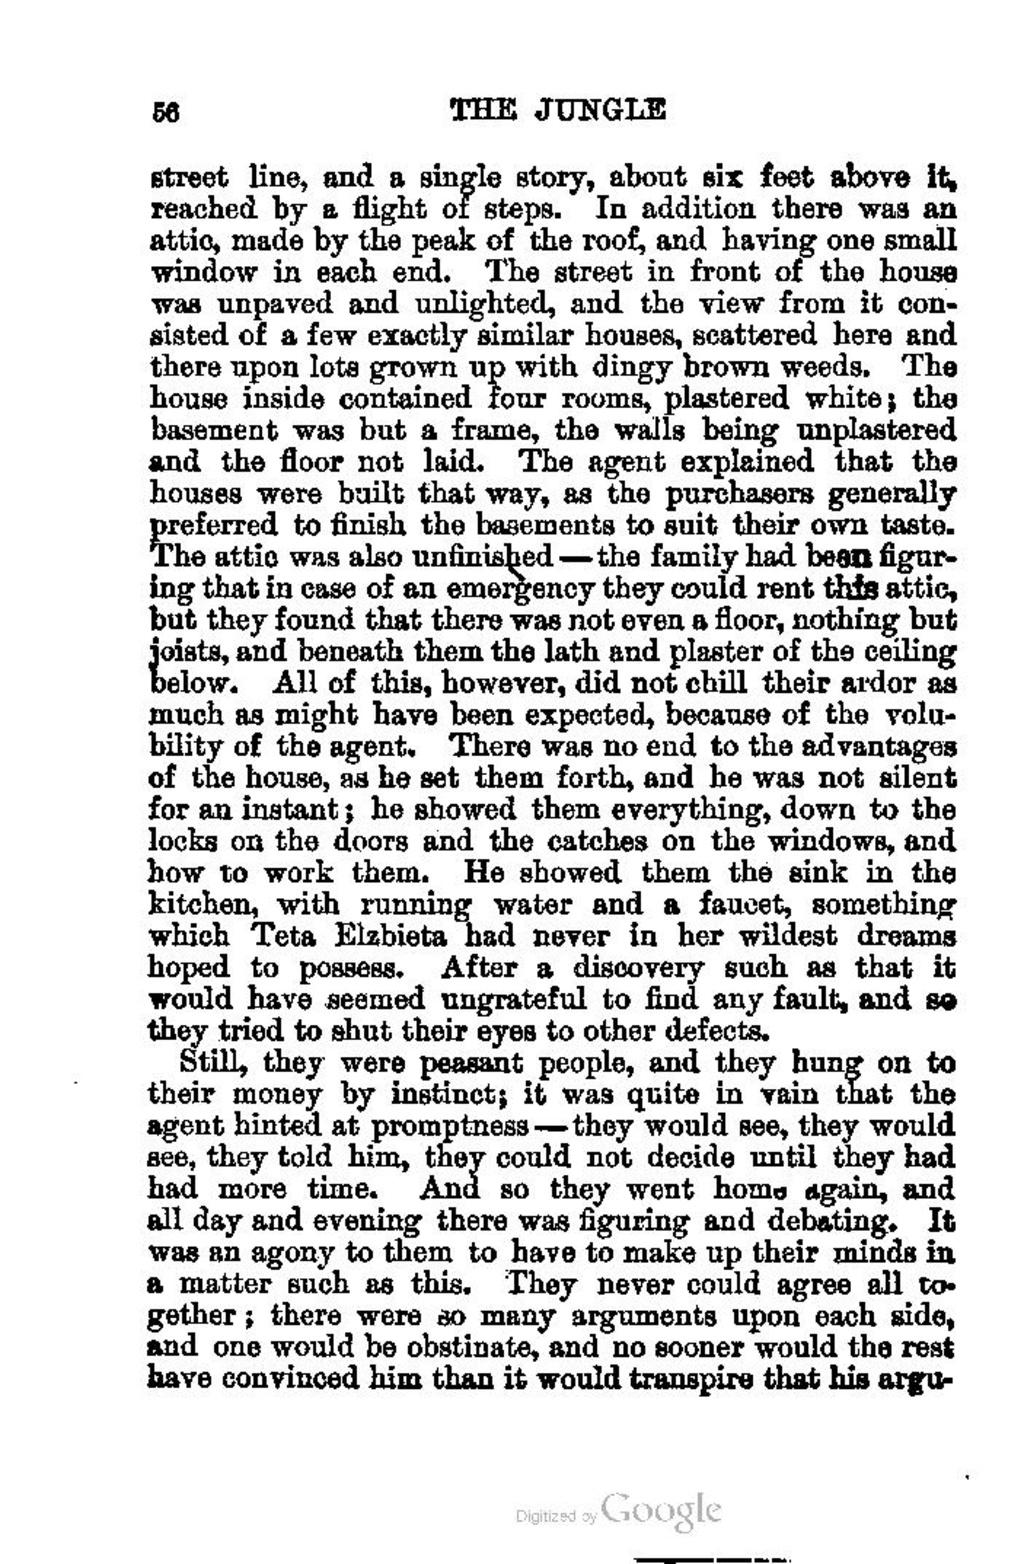 page upton sinclair the jungle 1920 imprint pdf 71 wikisource